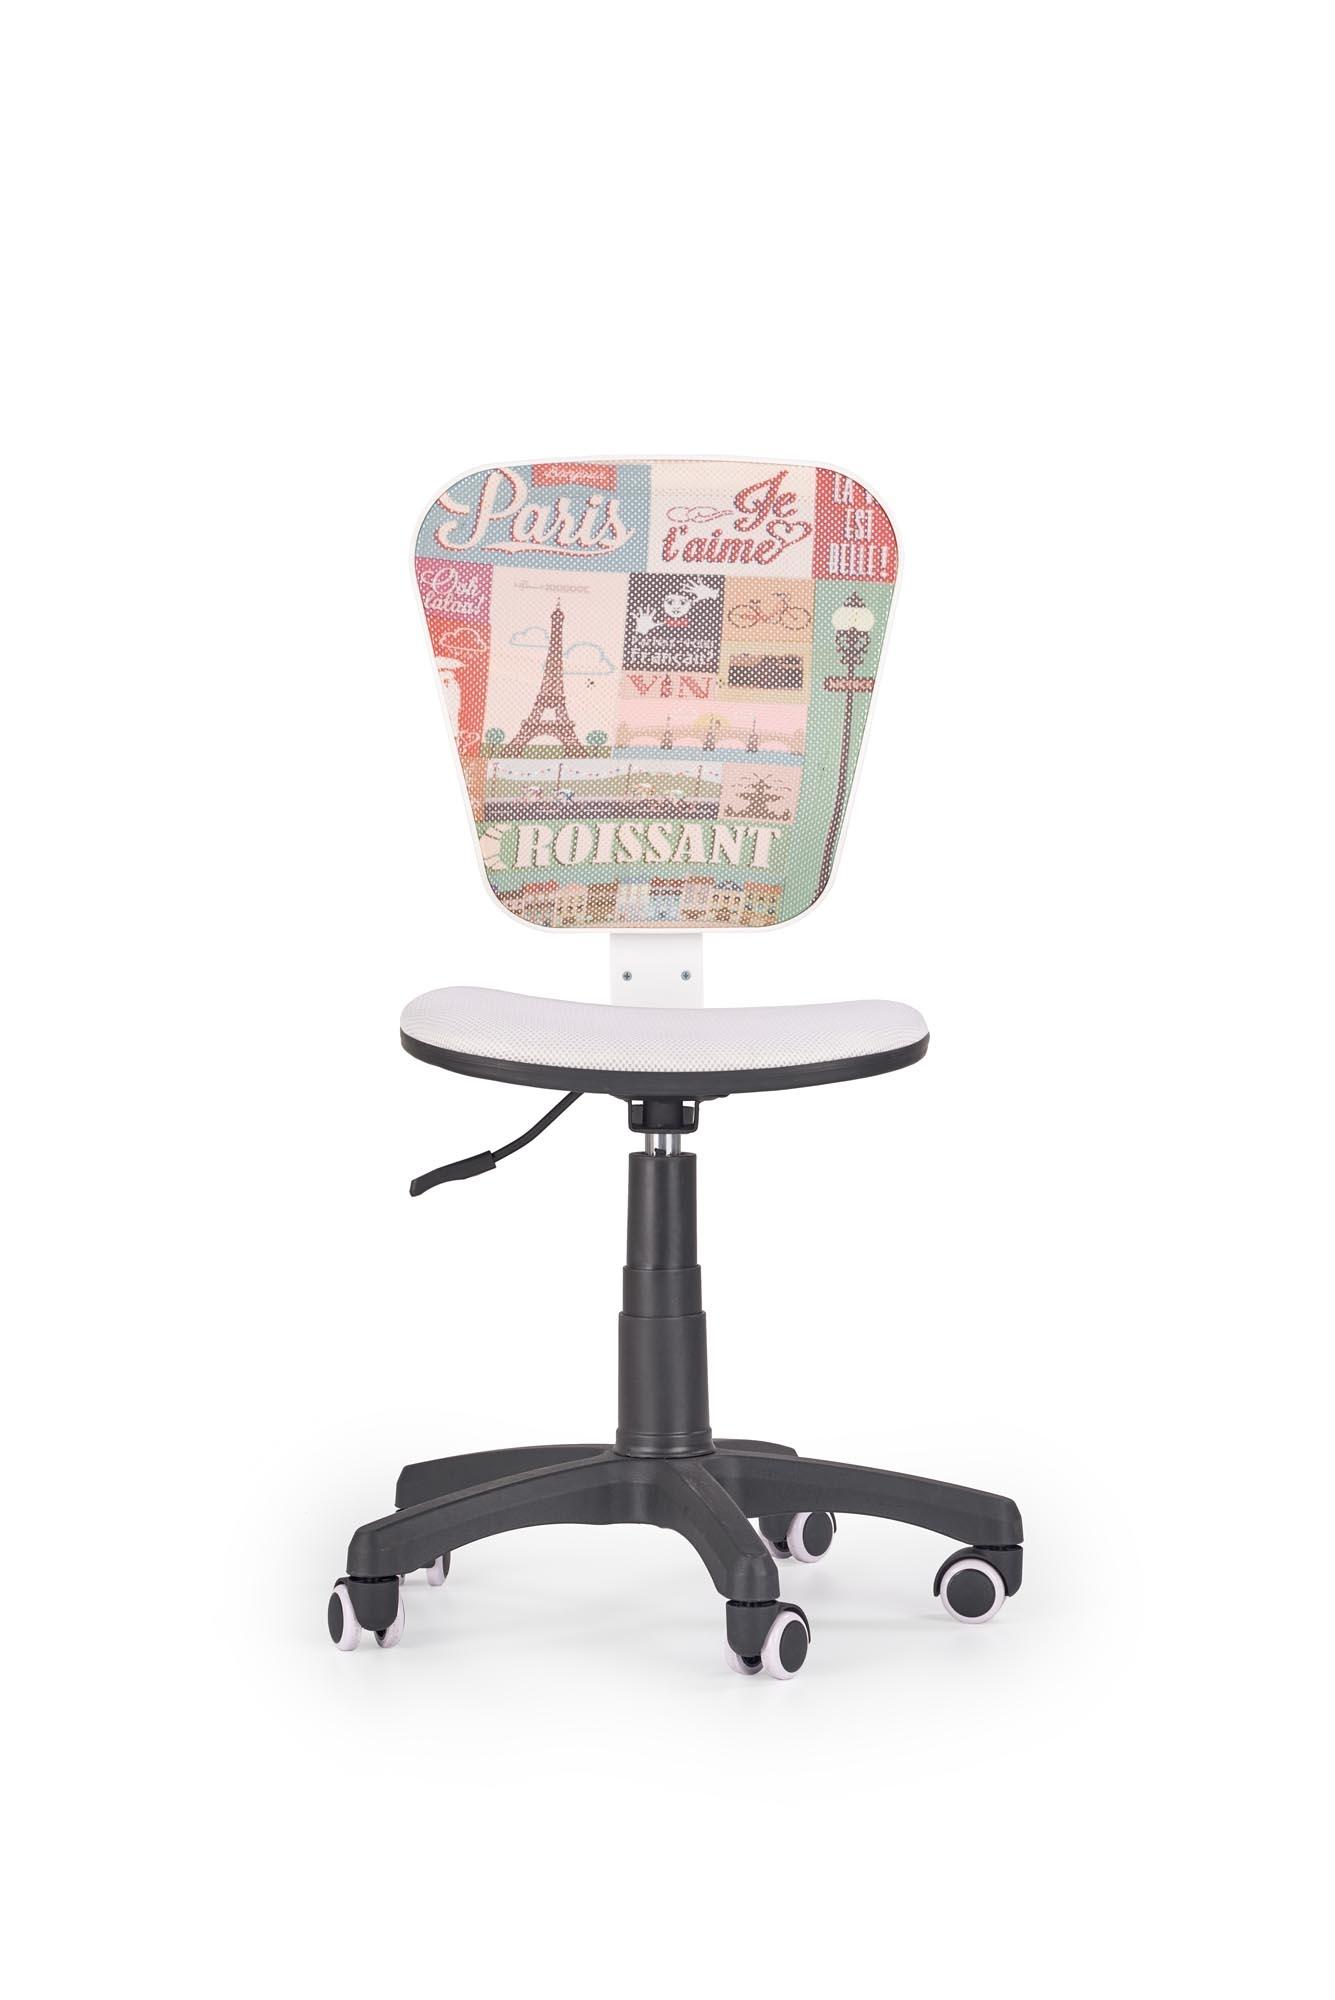 Scaun de birou pentru copii, tapitat cu stofa Flyer Paris, l53xA52xH83-95 cm poza